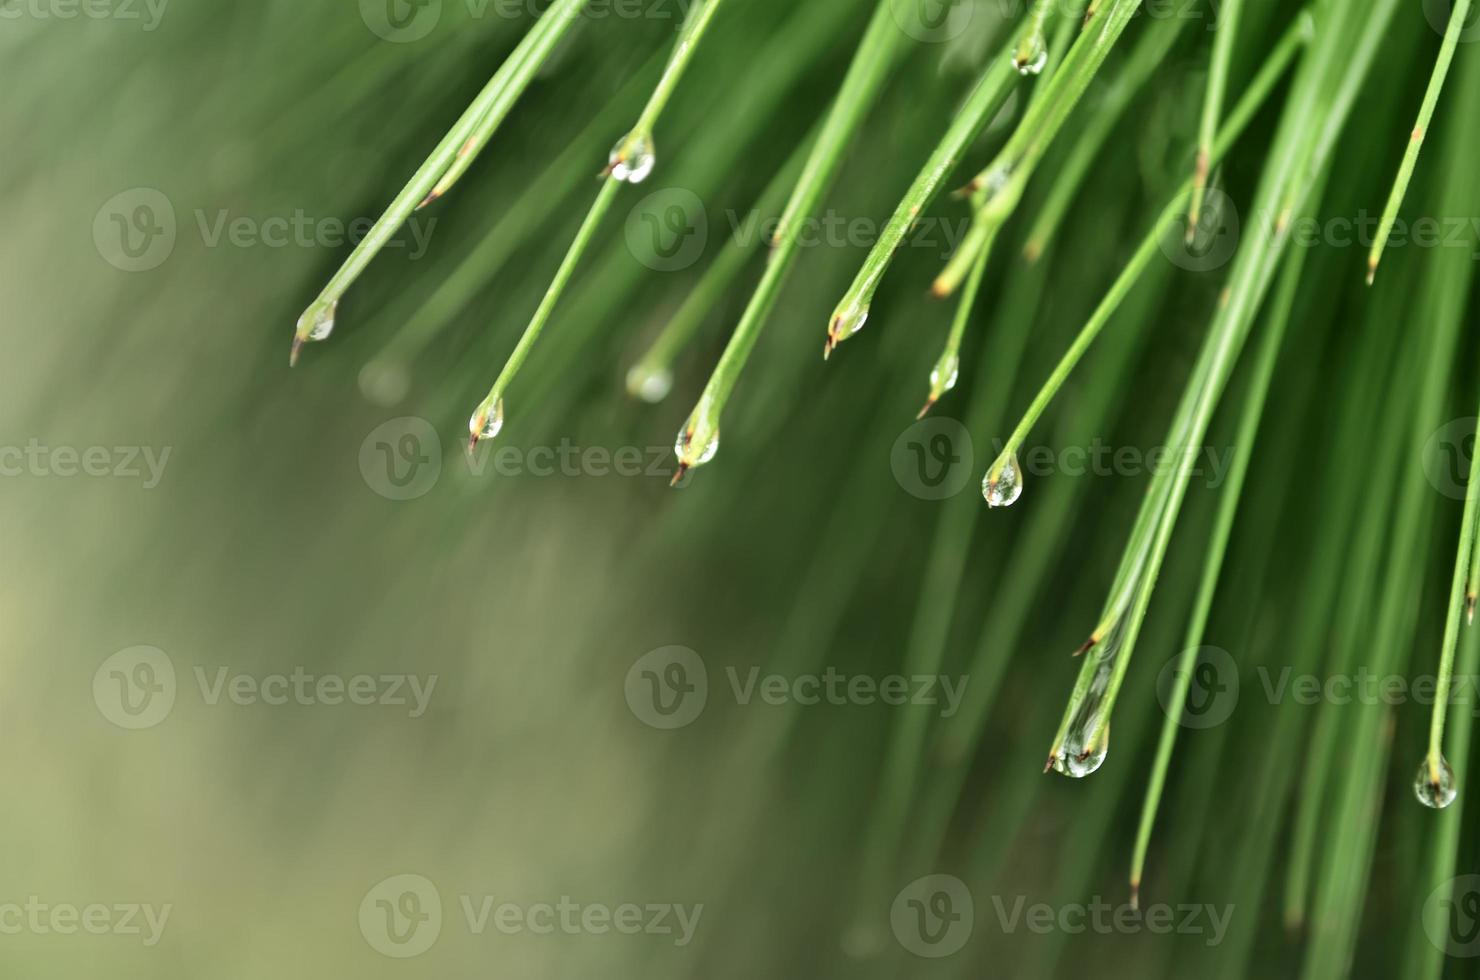 Raindrops on pine leaves photo